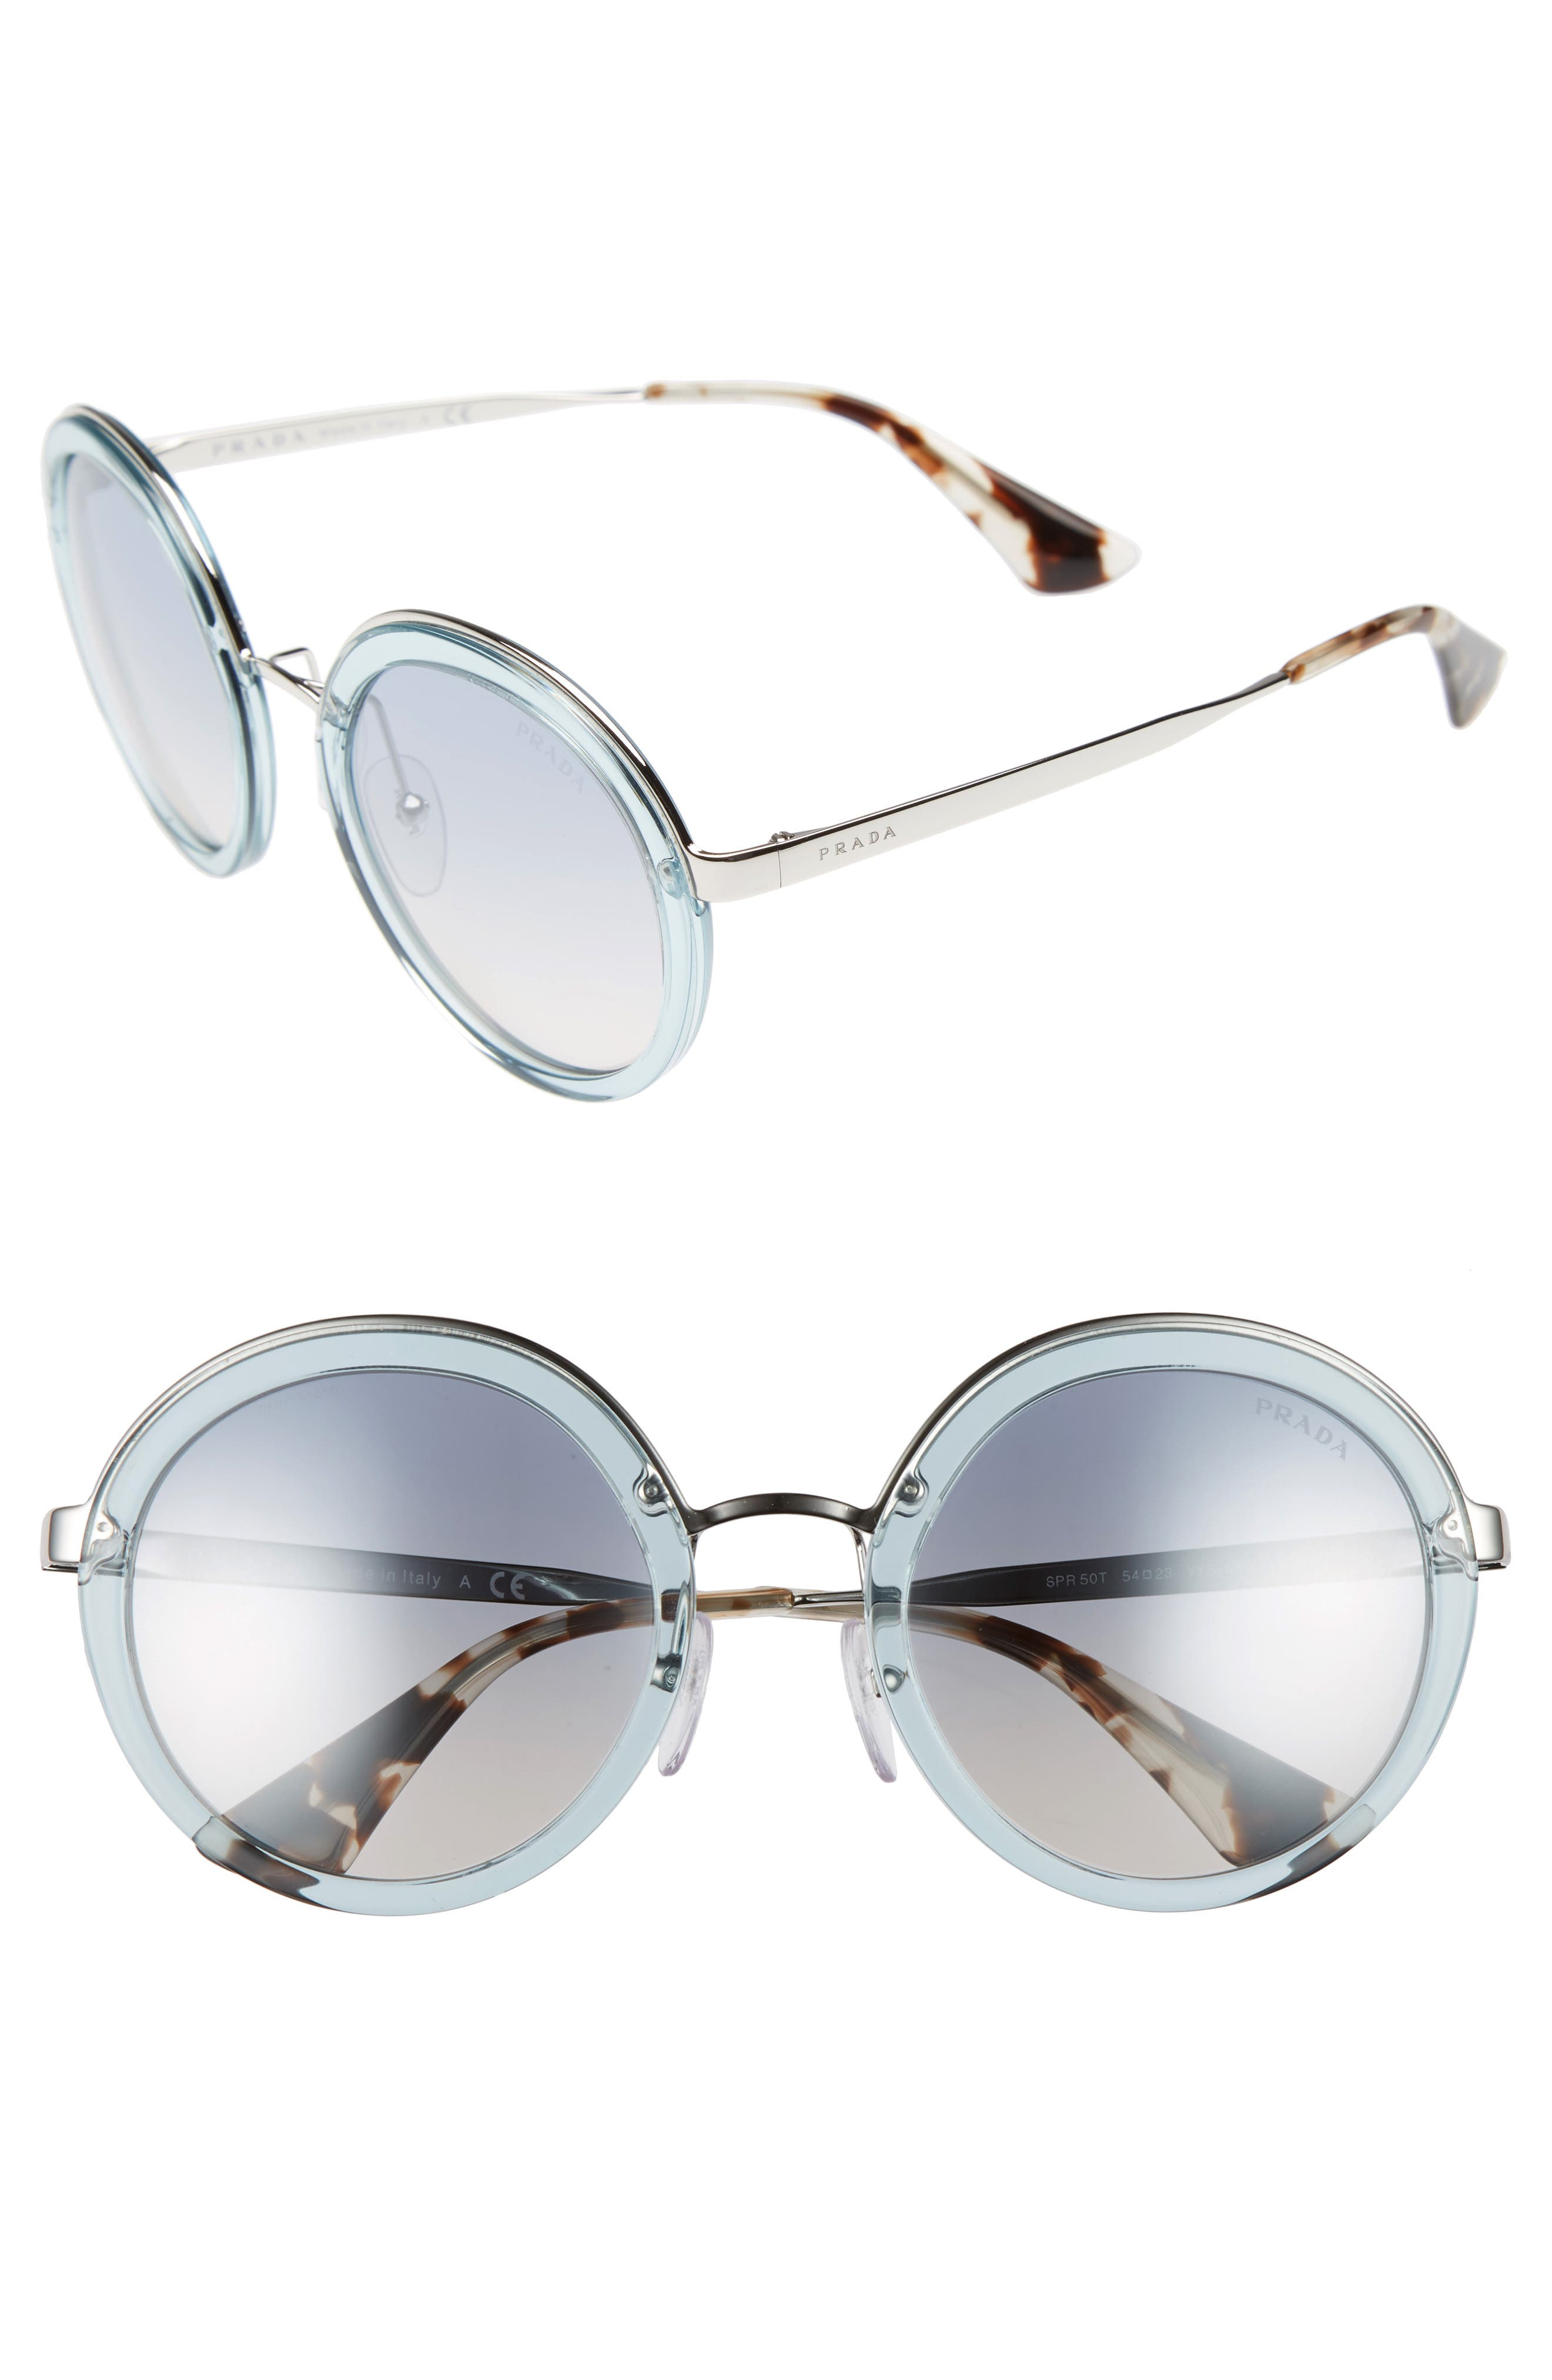 PRADA,                             54mm Round Sunglasses,                             Main thumbnail 1, color,                             400